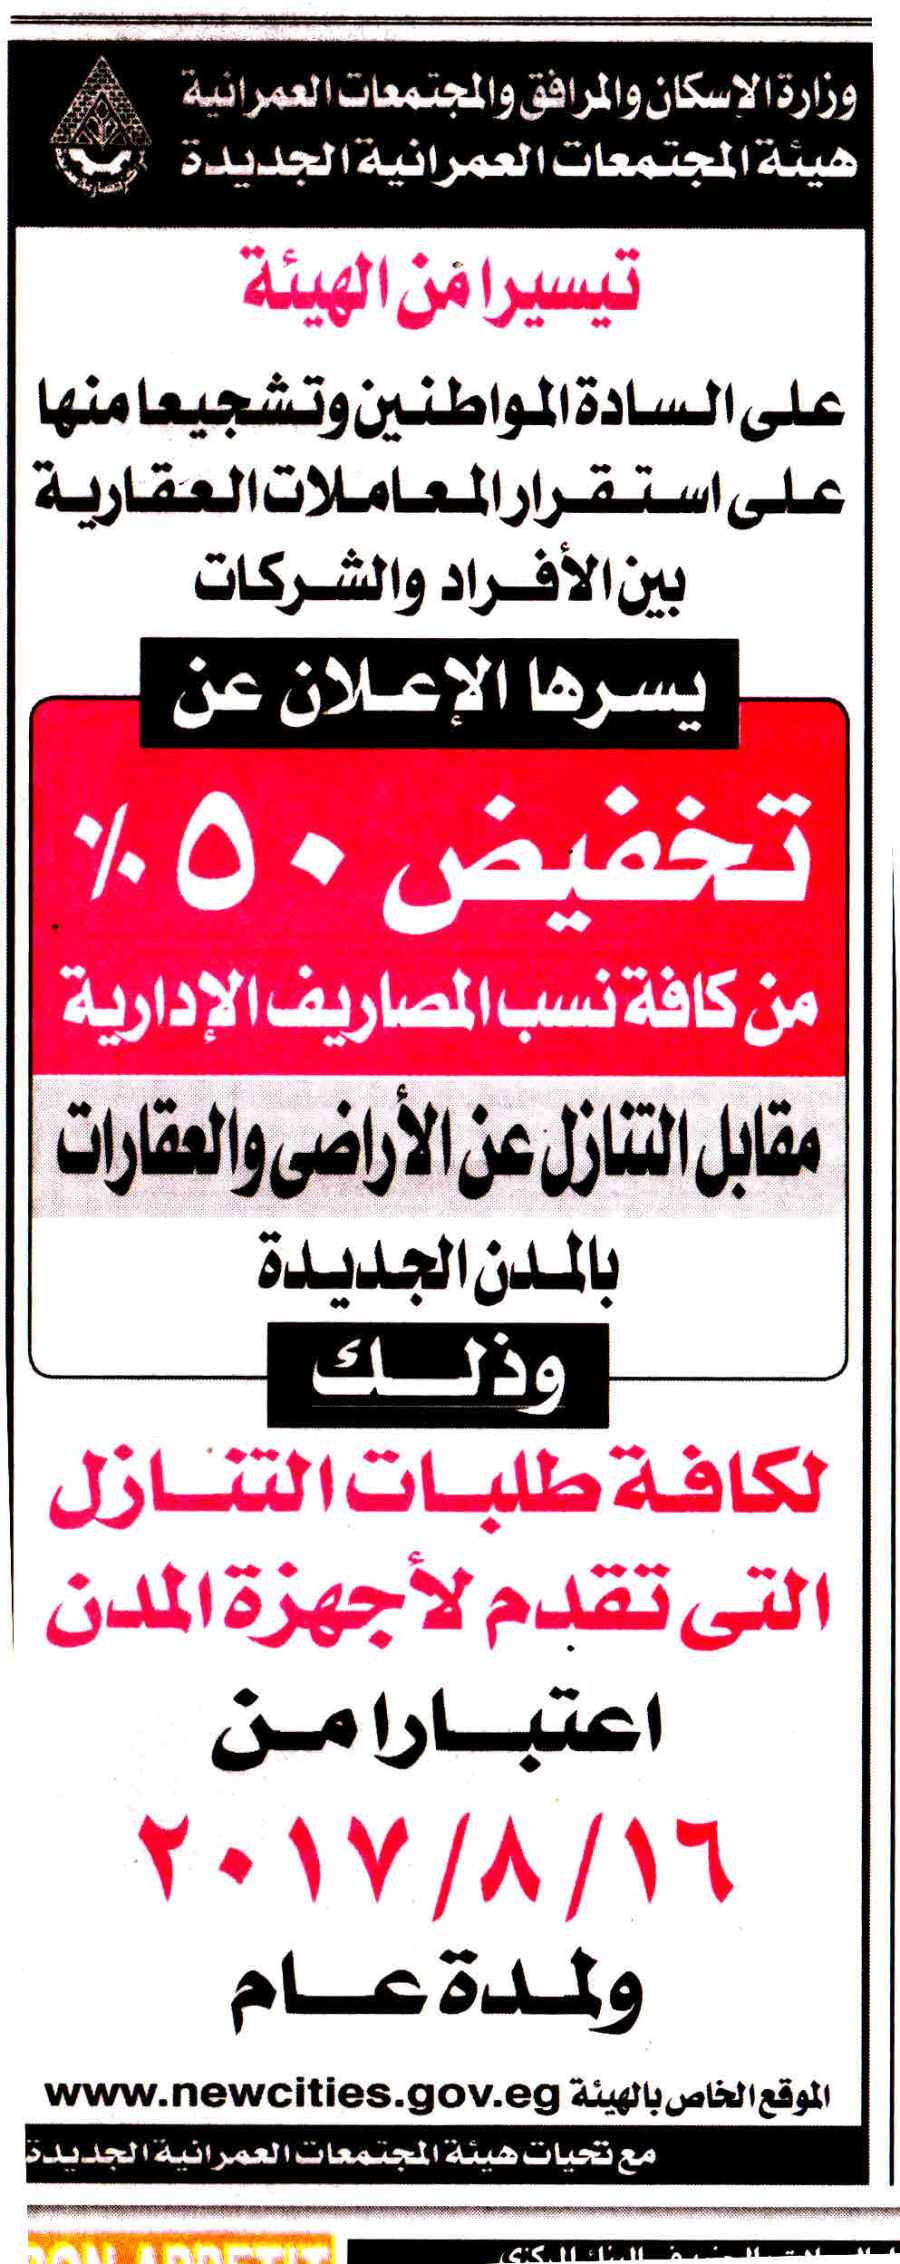 Al Ahram 9 Sep P.1.jpg